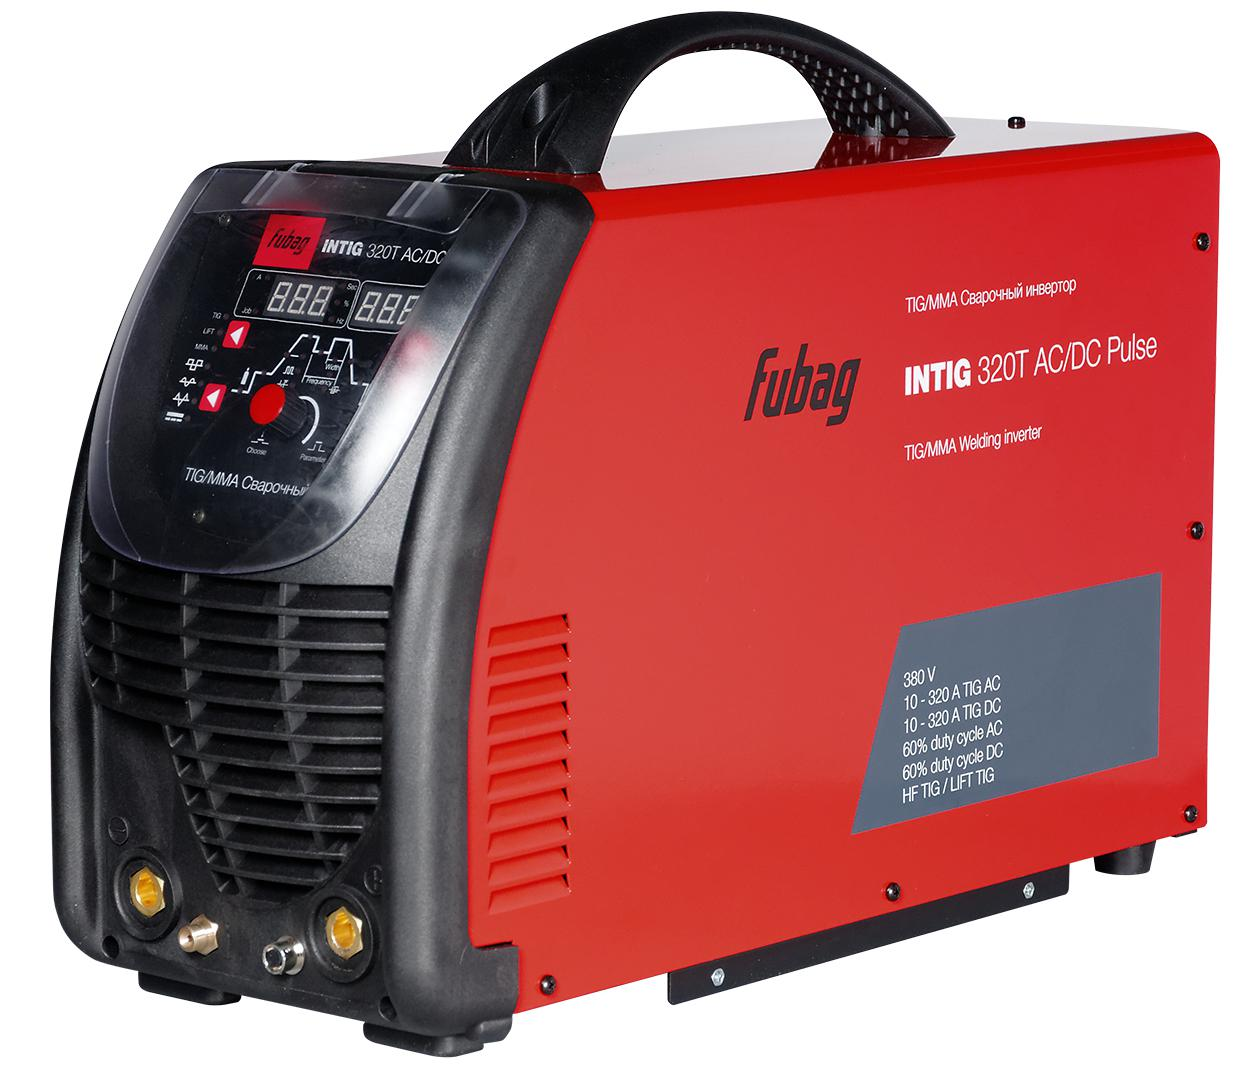 цена на Инвертор Fubag Intig 320 t ac/dc pulse + fb tig 26 5p 4m (38459) (38431.2)